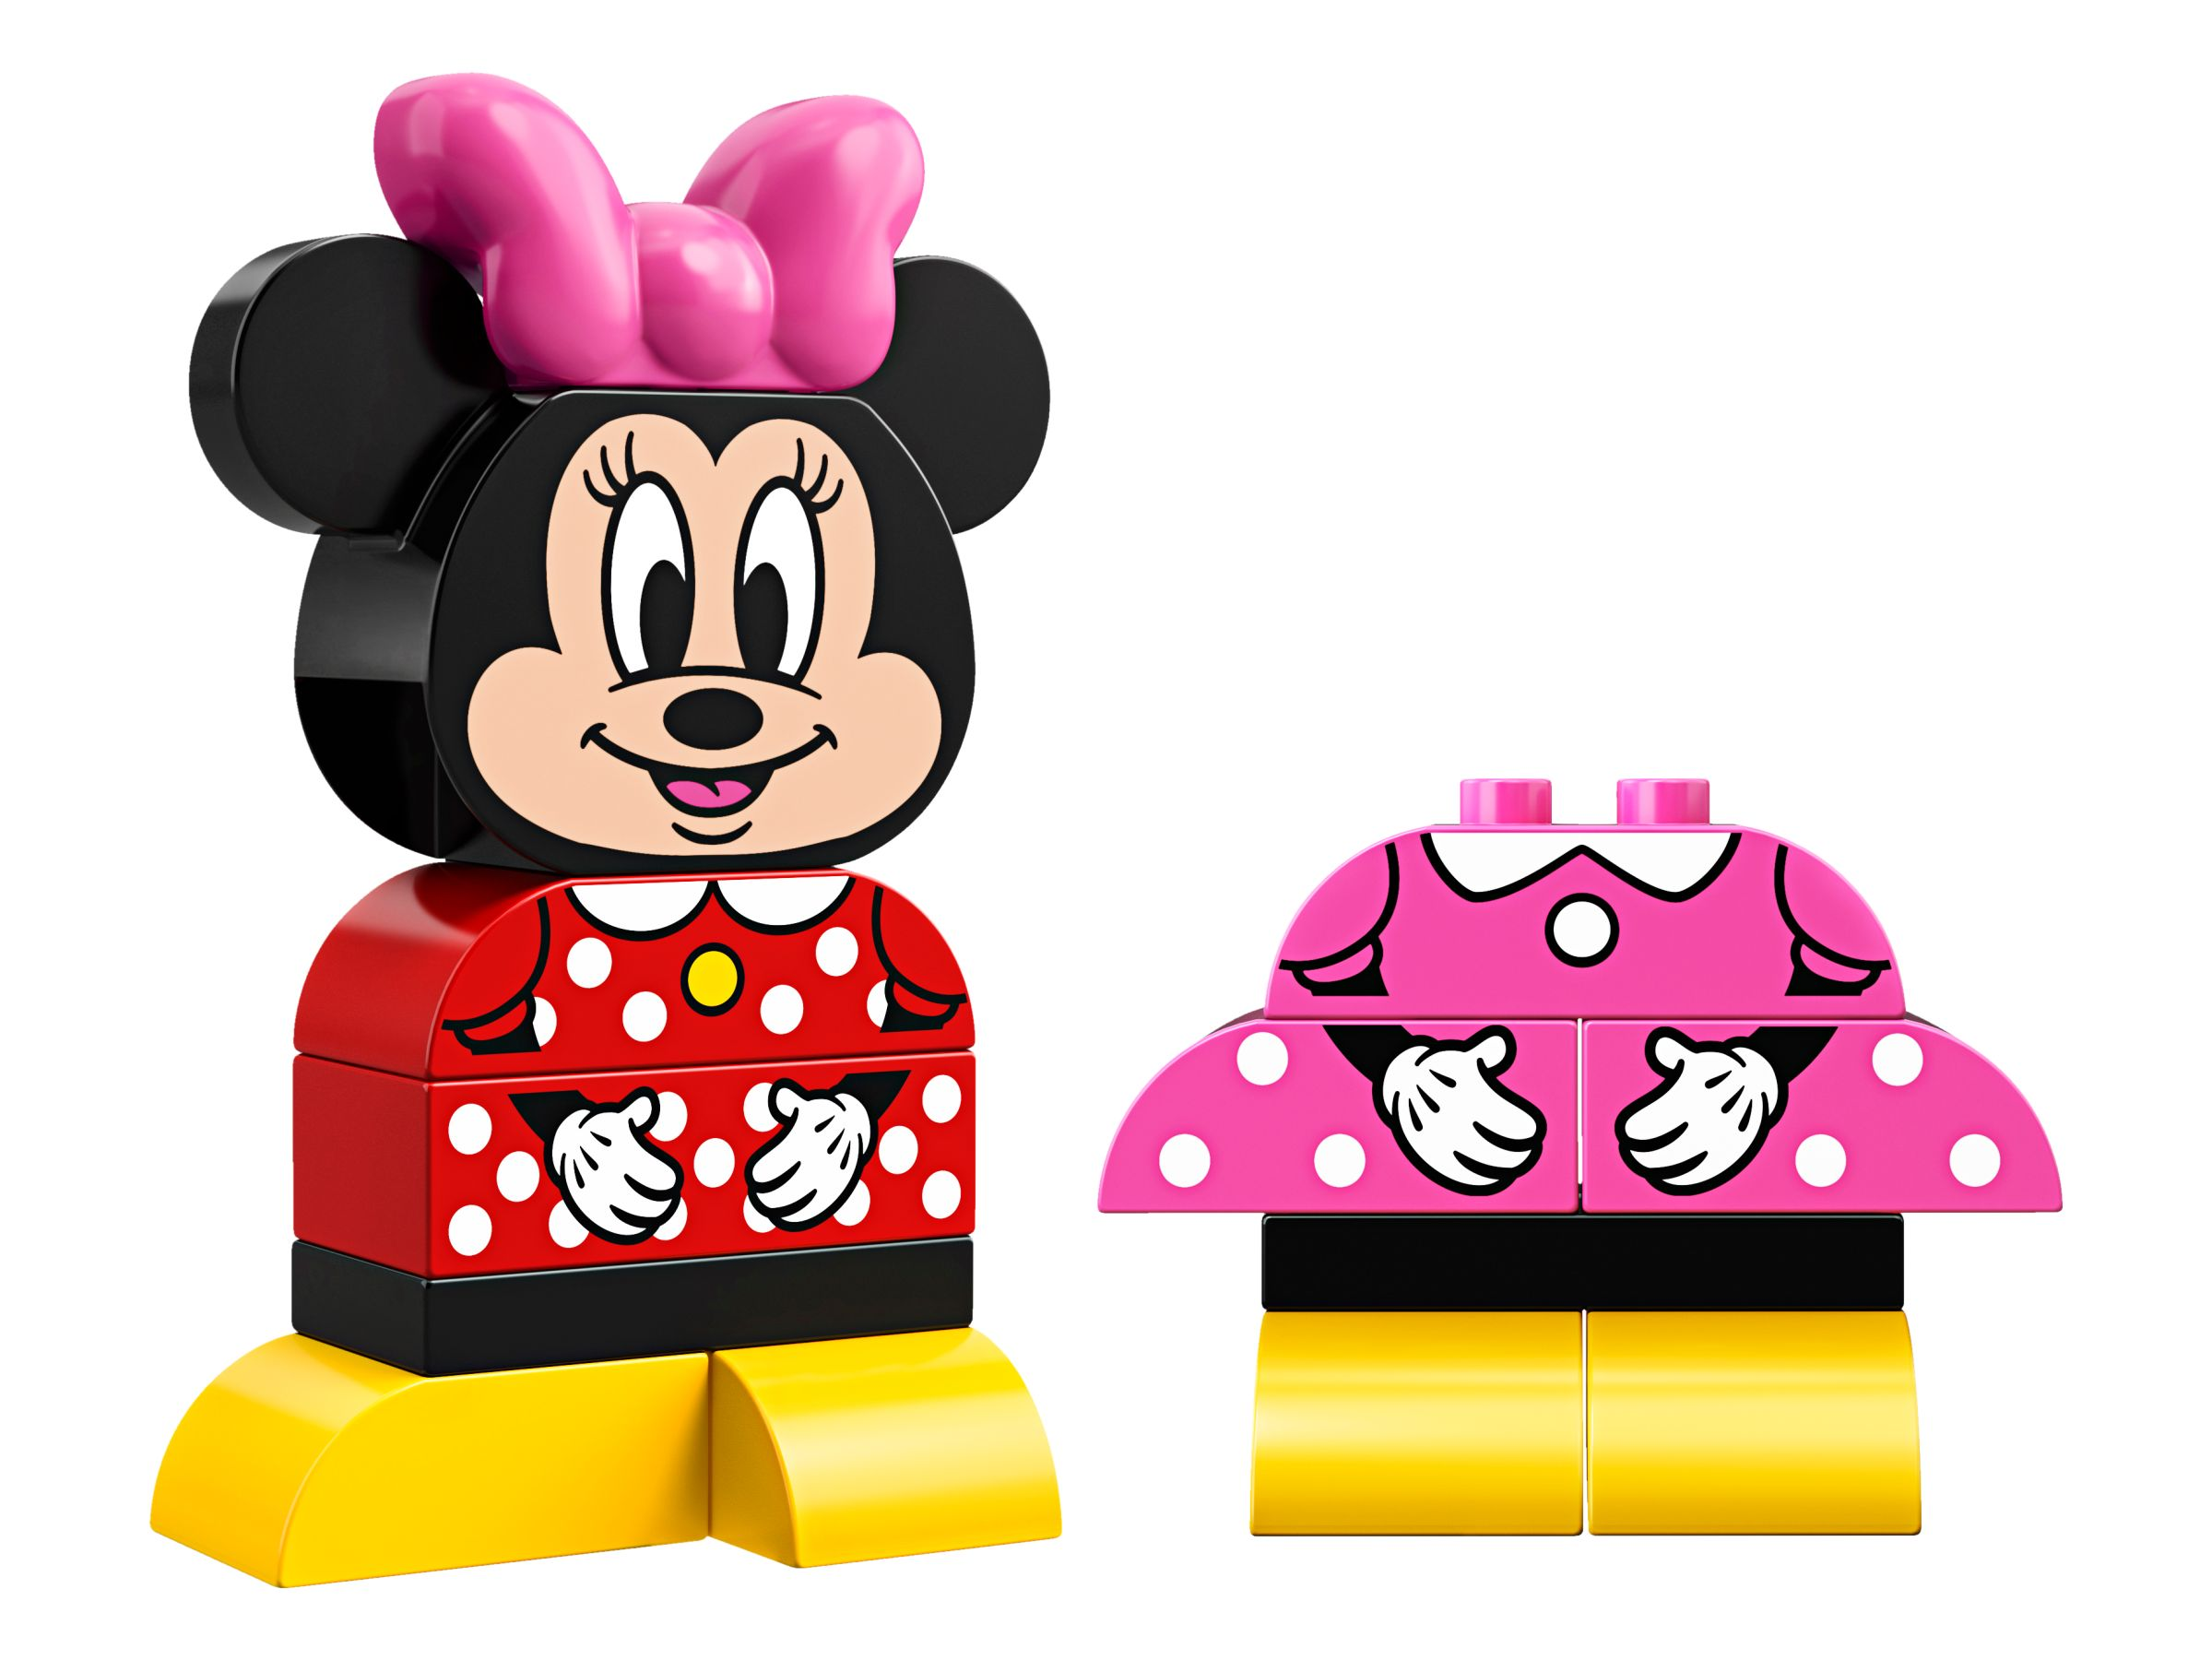 minnie maus fabulous minnie maus bettwasche minnie maus bett rosa mickey und minnie maus. Black Bedroom Furniture Sets. Home Design Ideas